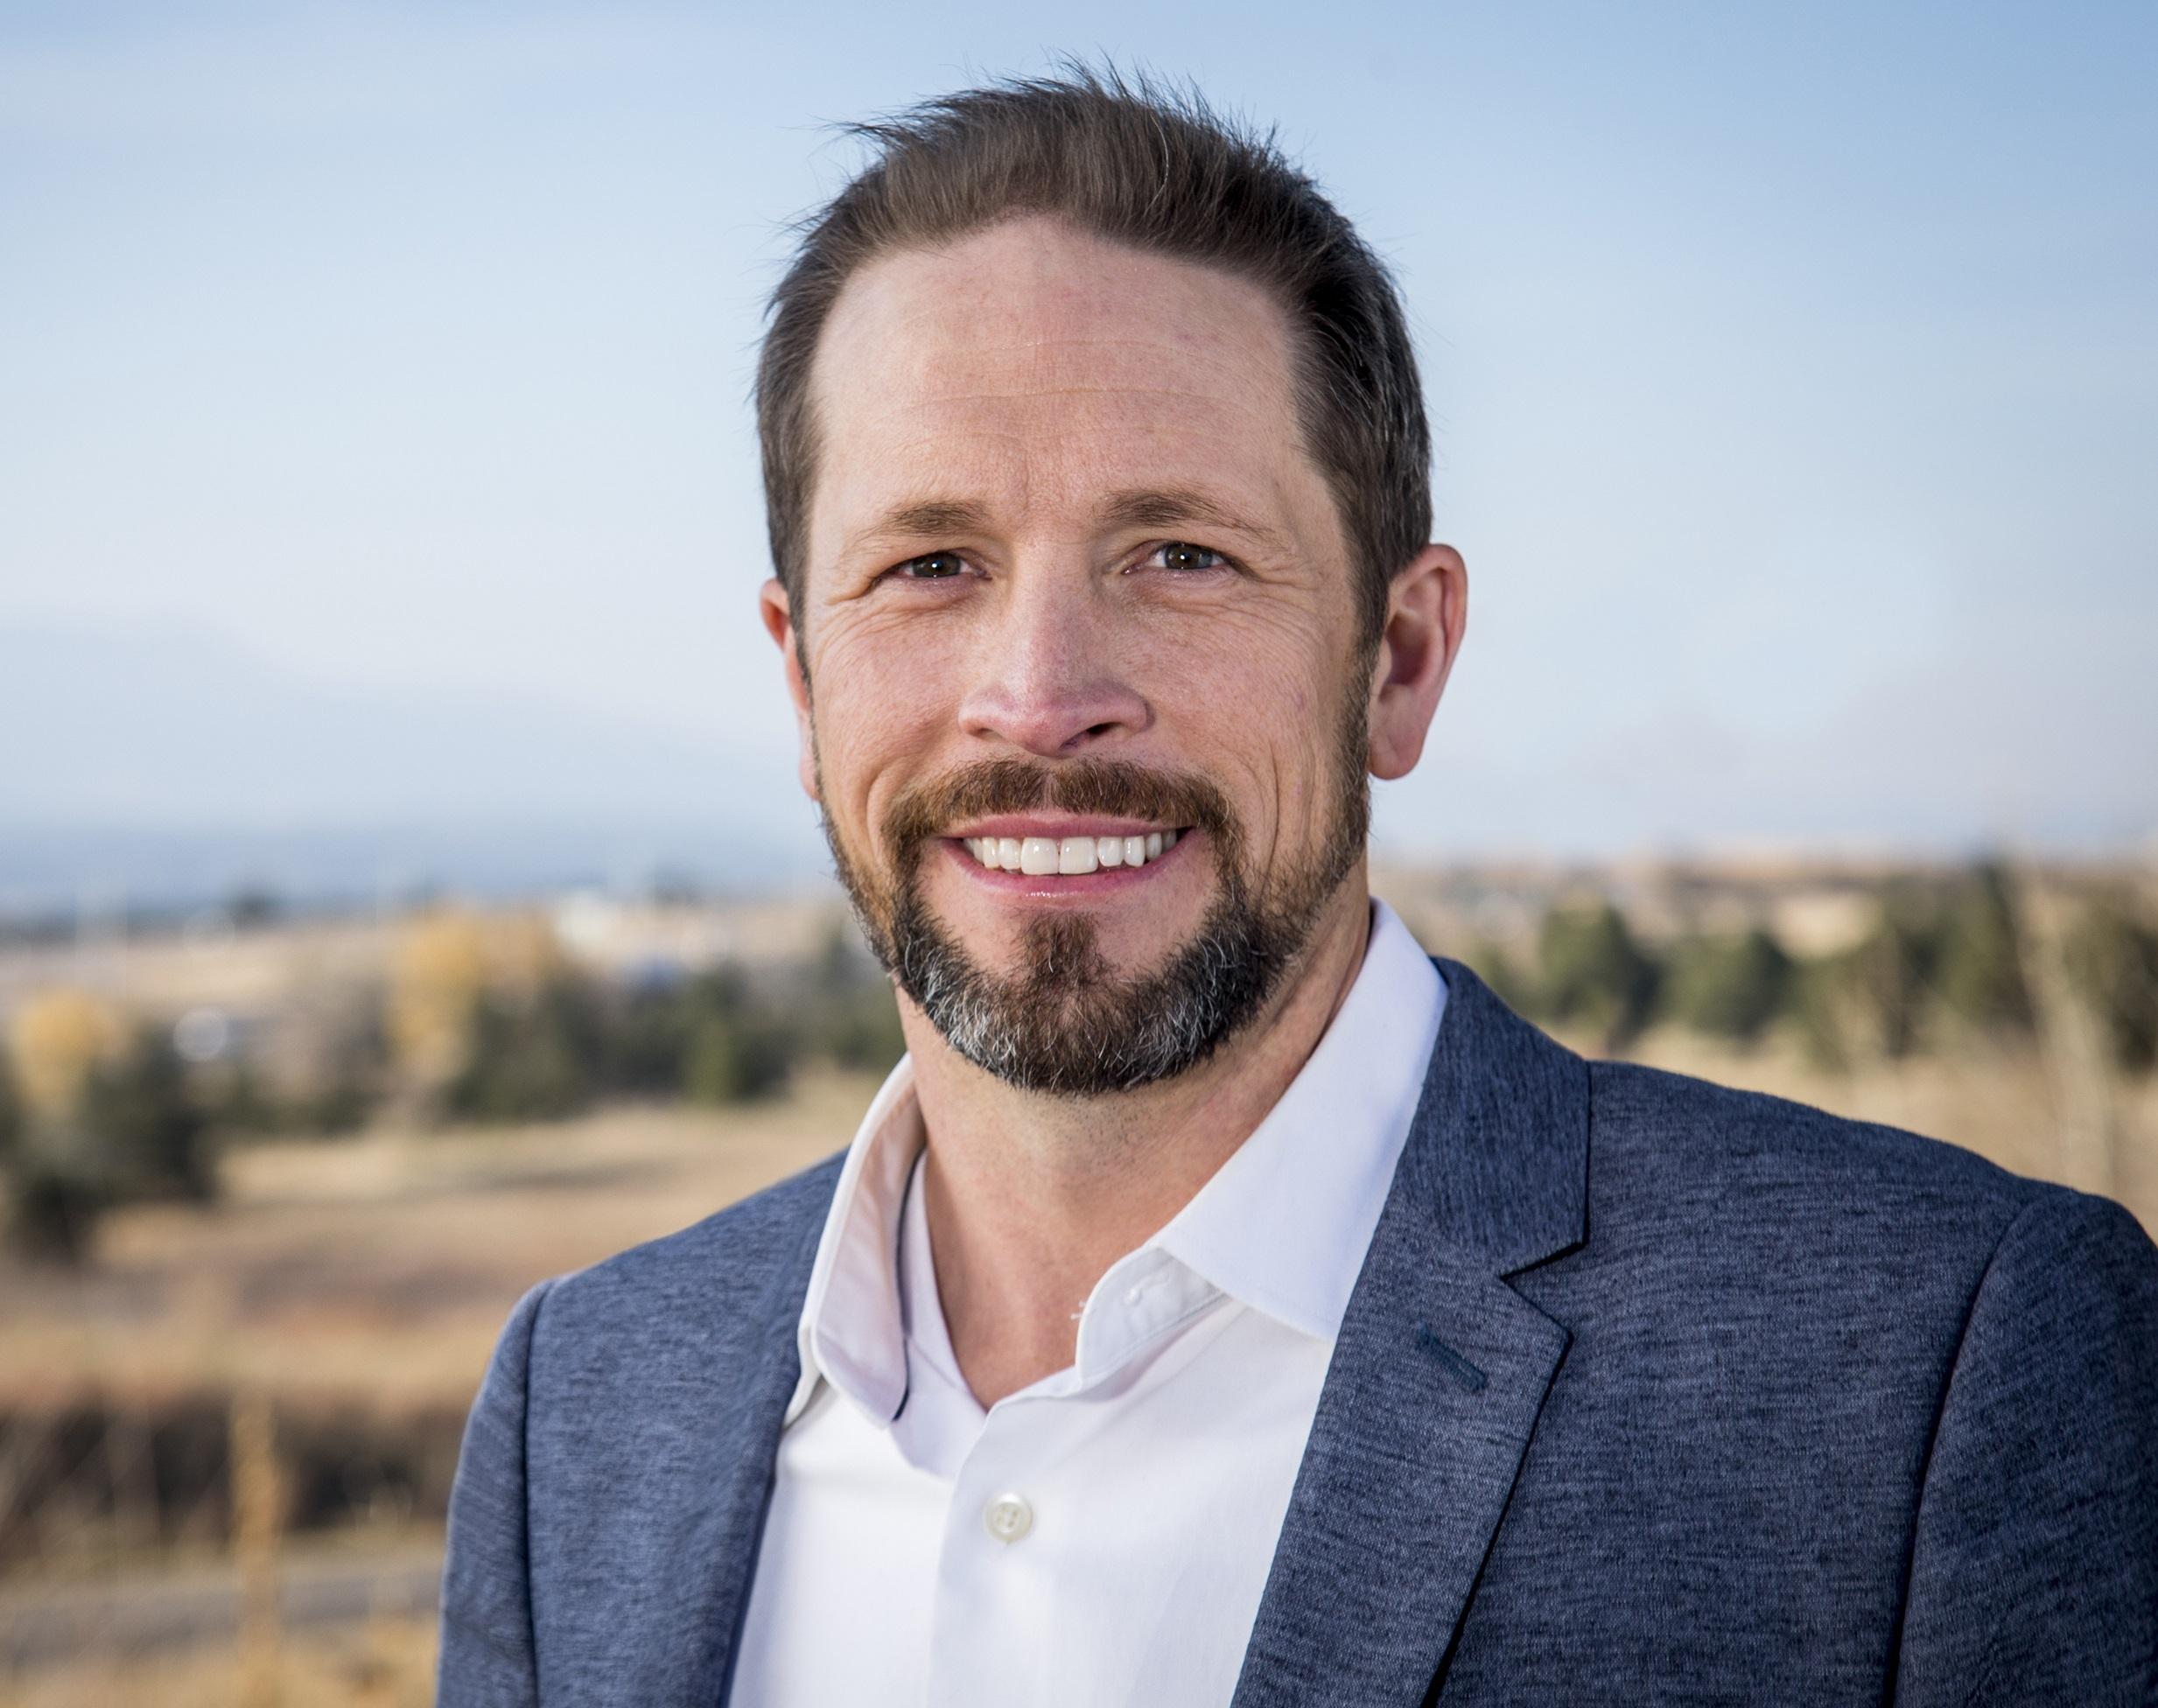 Image of Todd Crane, partner of The Exodus Road.